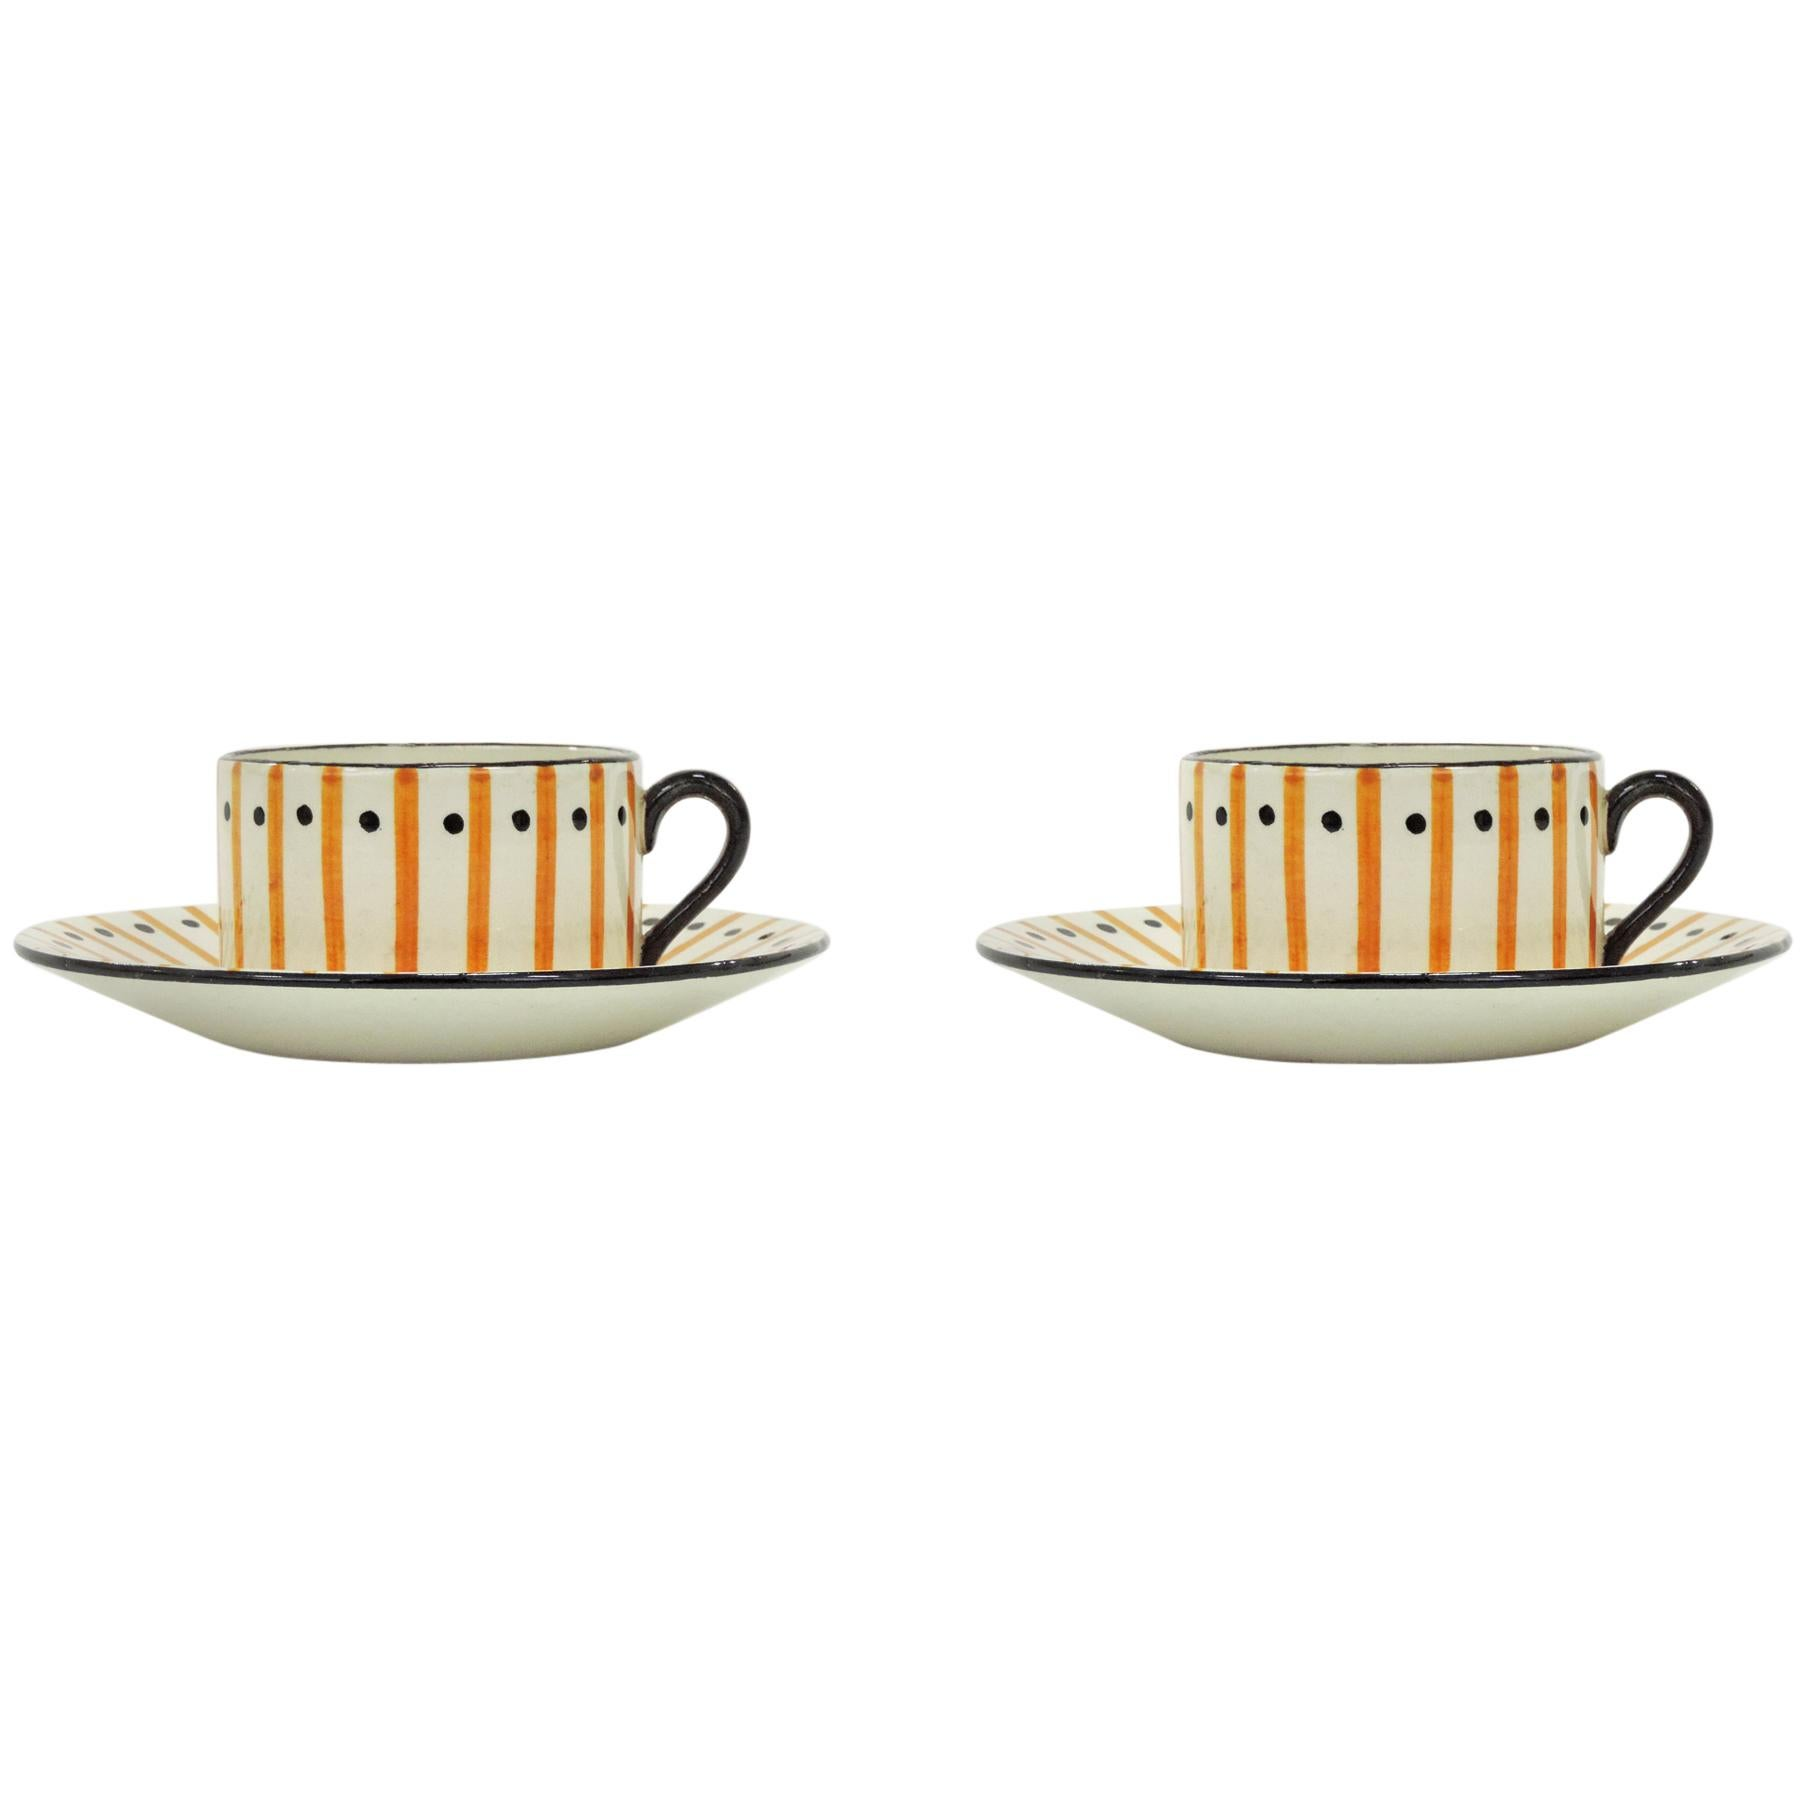 Pair of Art Deco Atelier Primavera Tea Set, France, 1930s